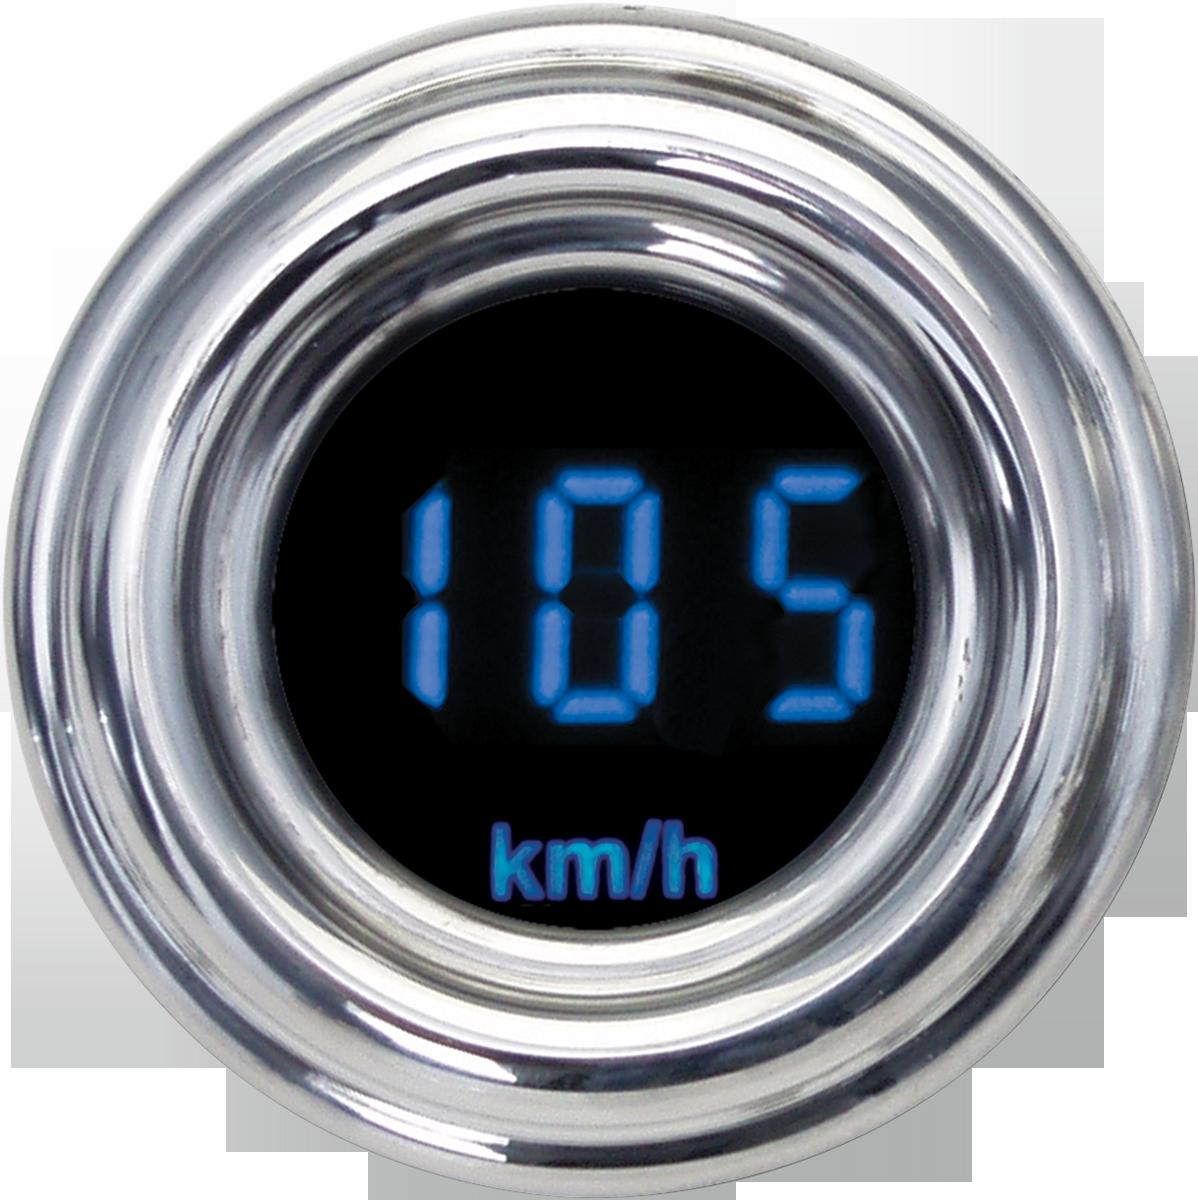 Dakota Digital Blue KPH 4000 Series Motorcycle Universal Speedo Speedometer